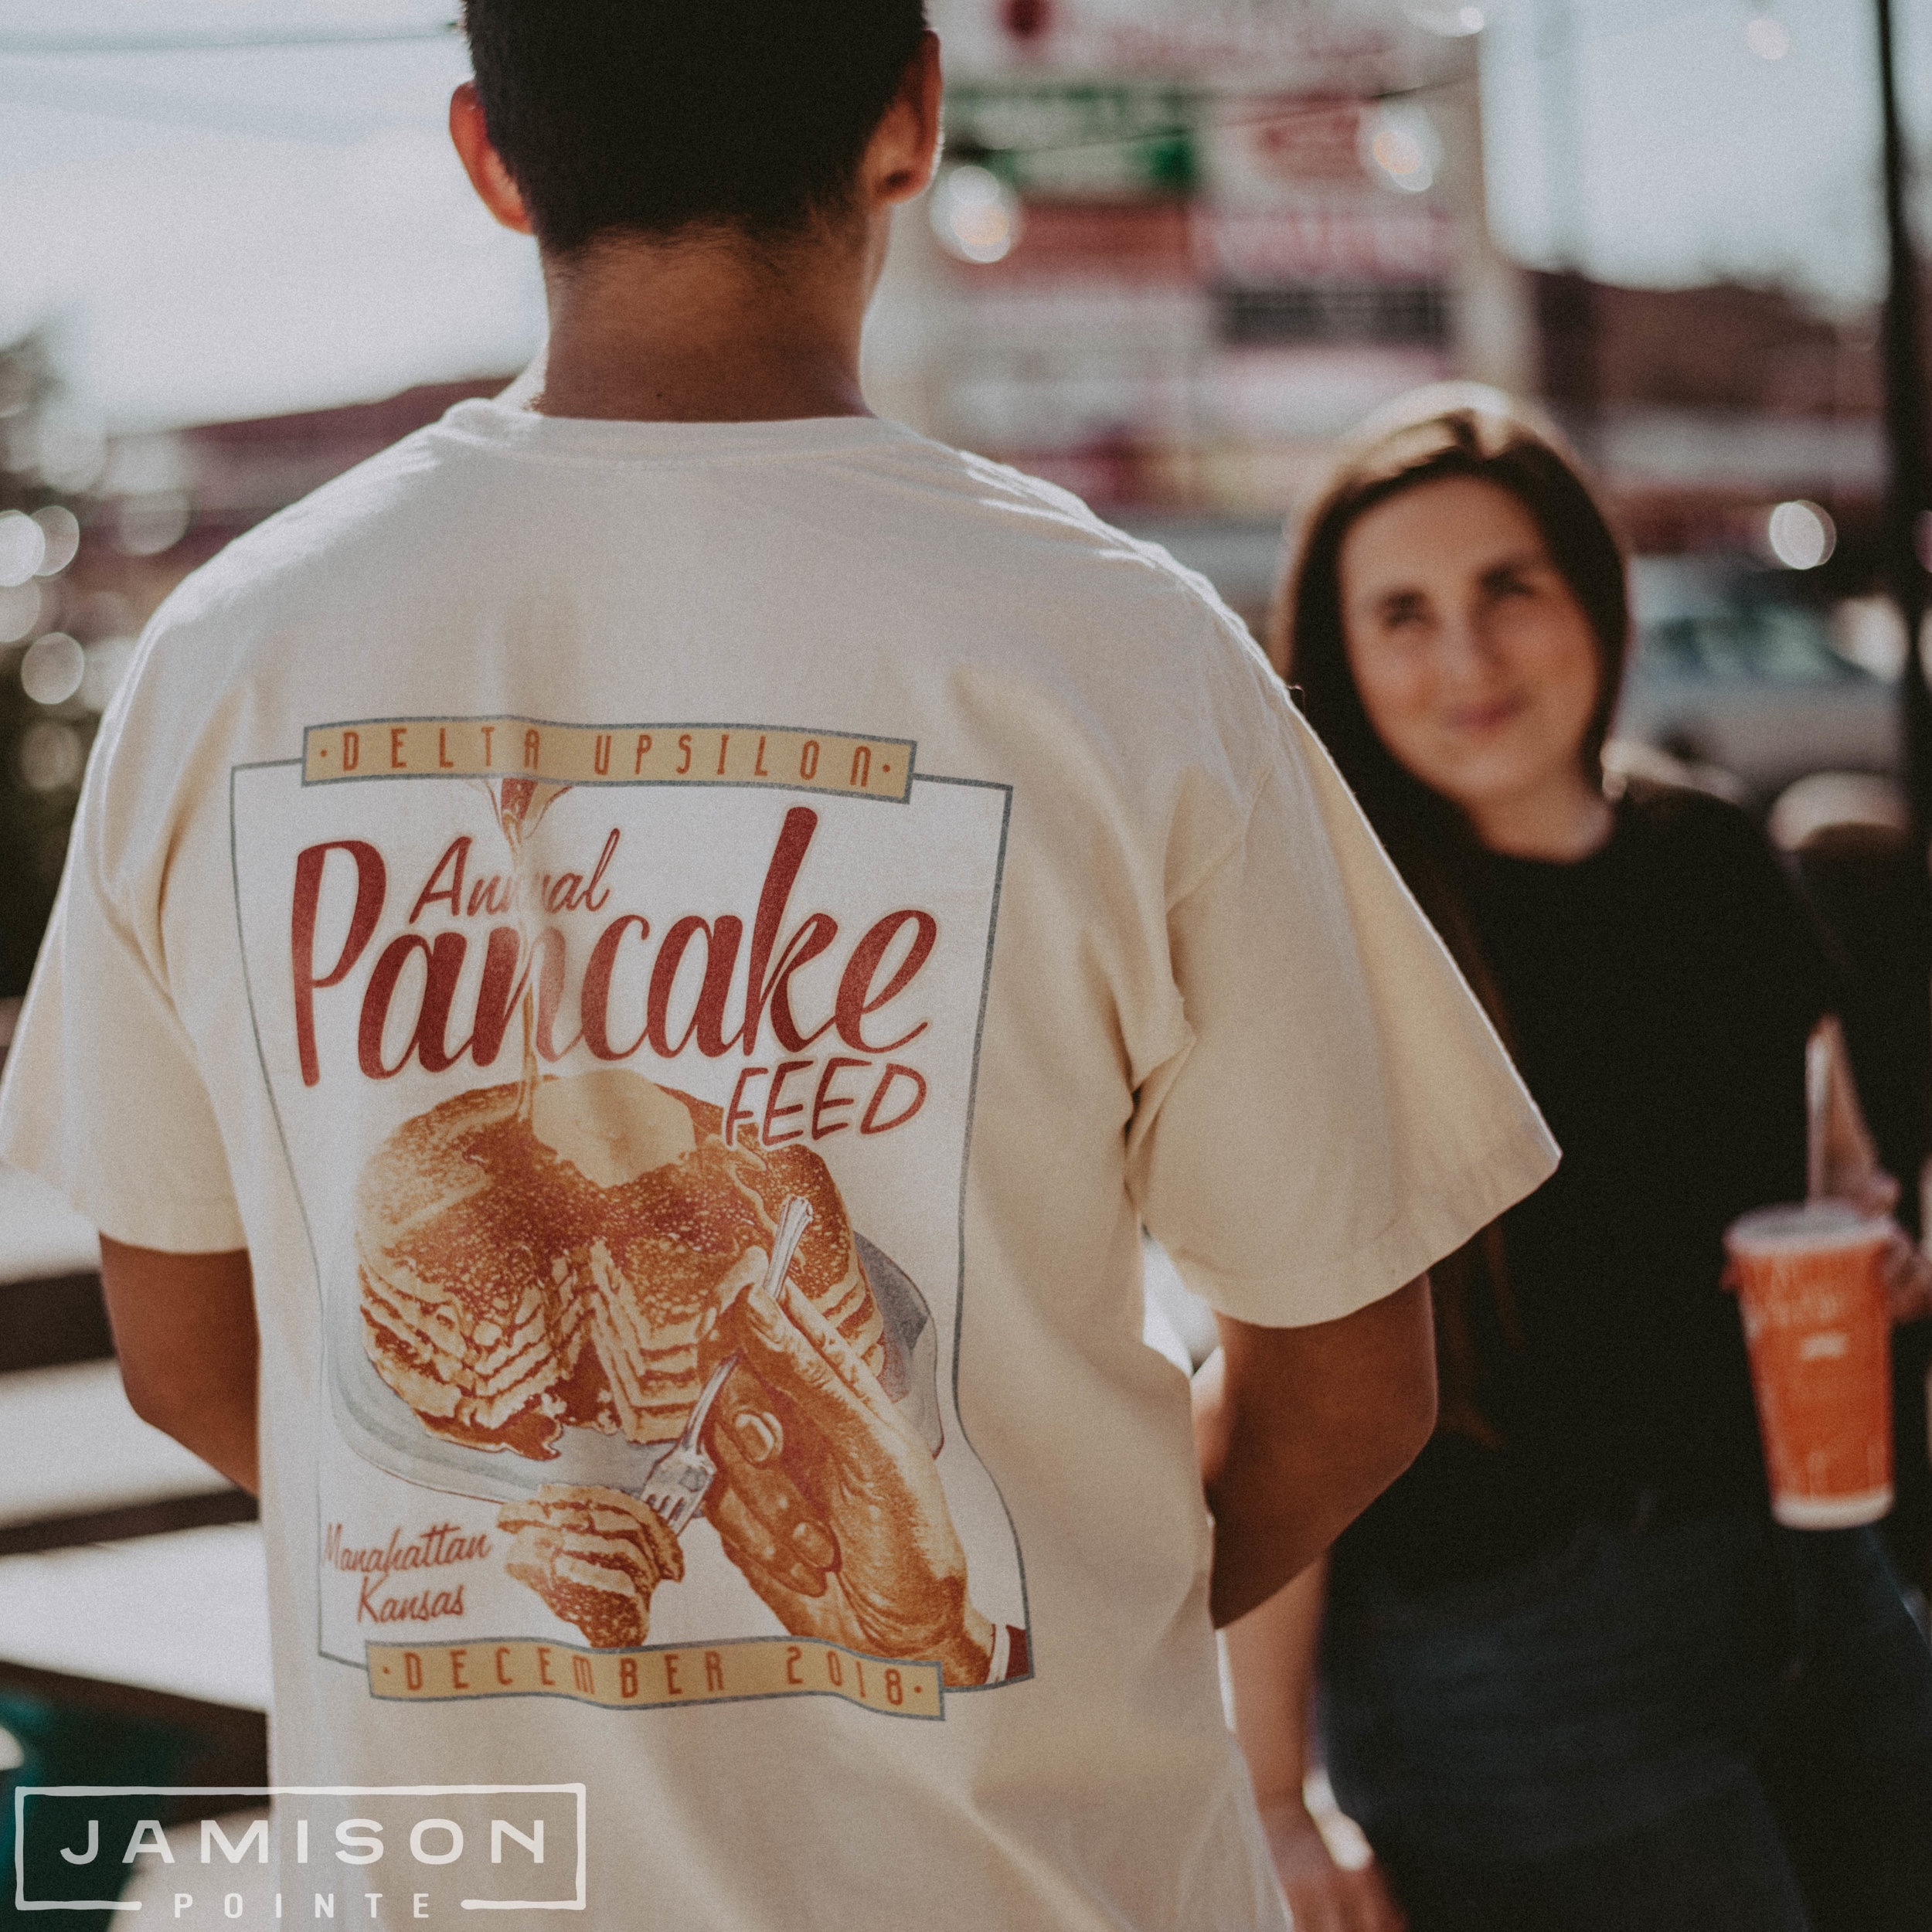 Delta Upsilon Pancake Philanthropy Tshirt